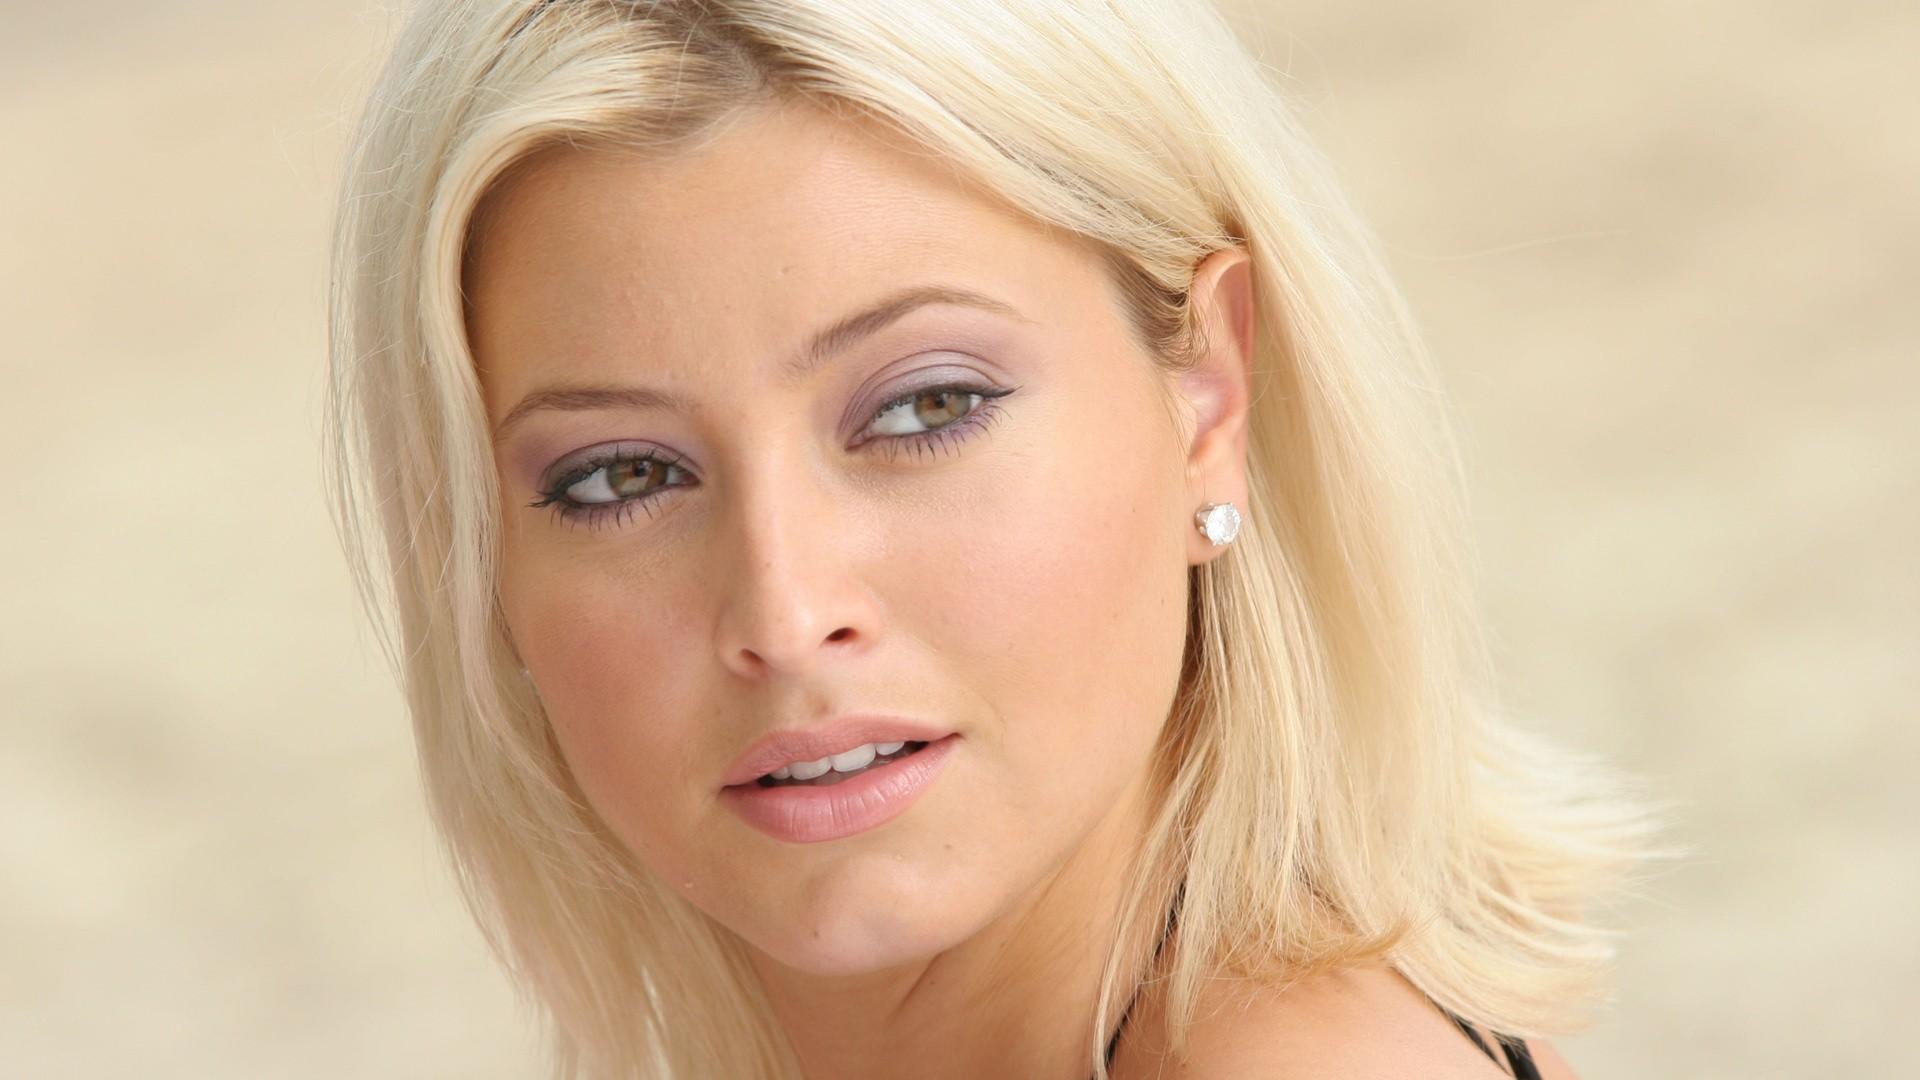 Фото на аву для блондинки за 40